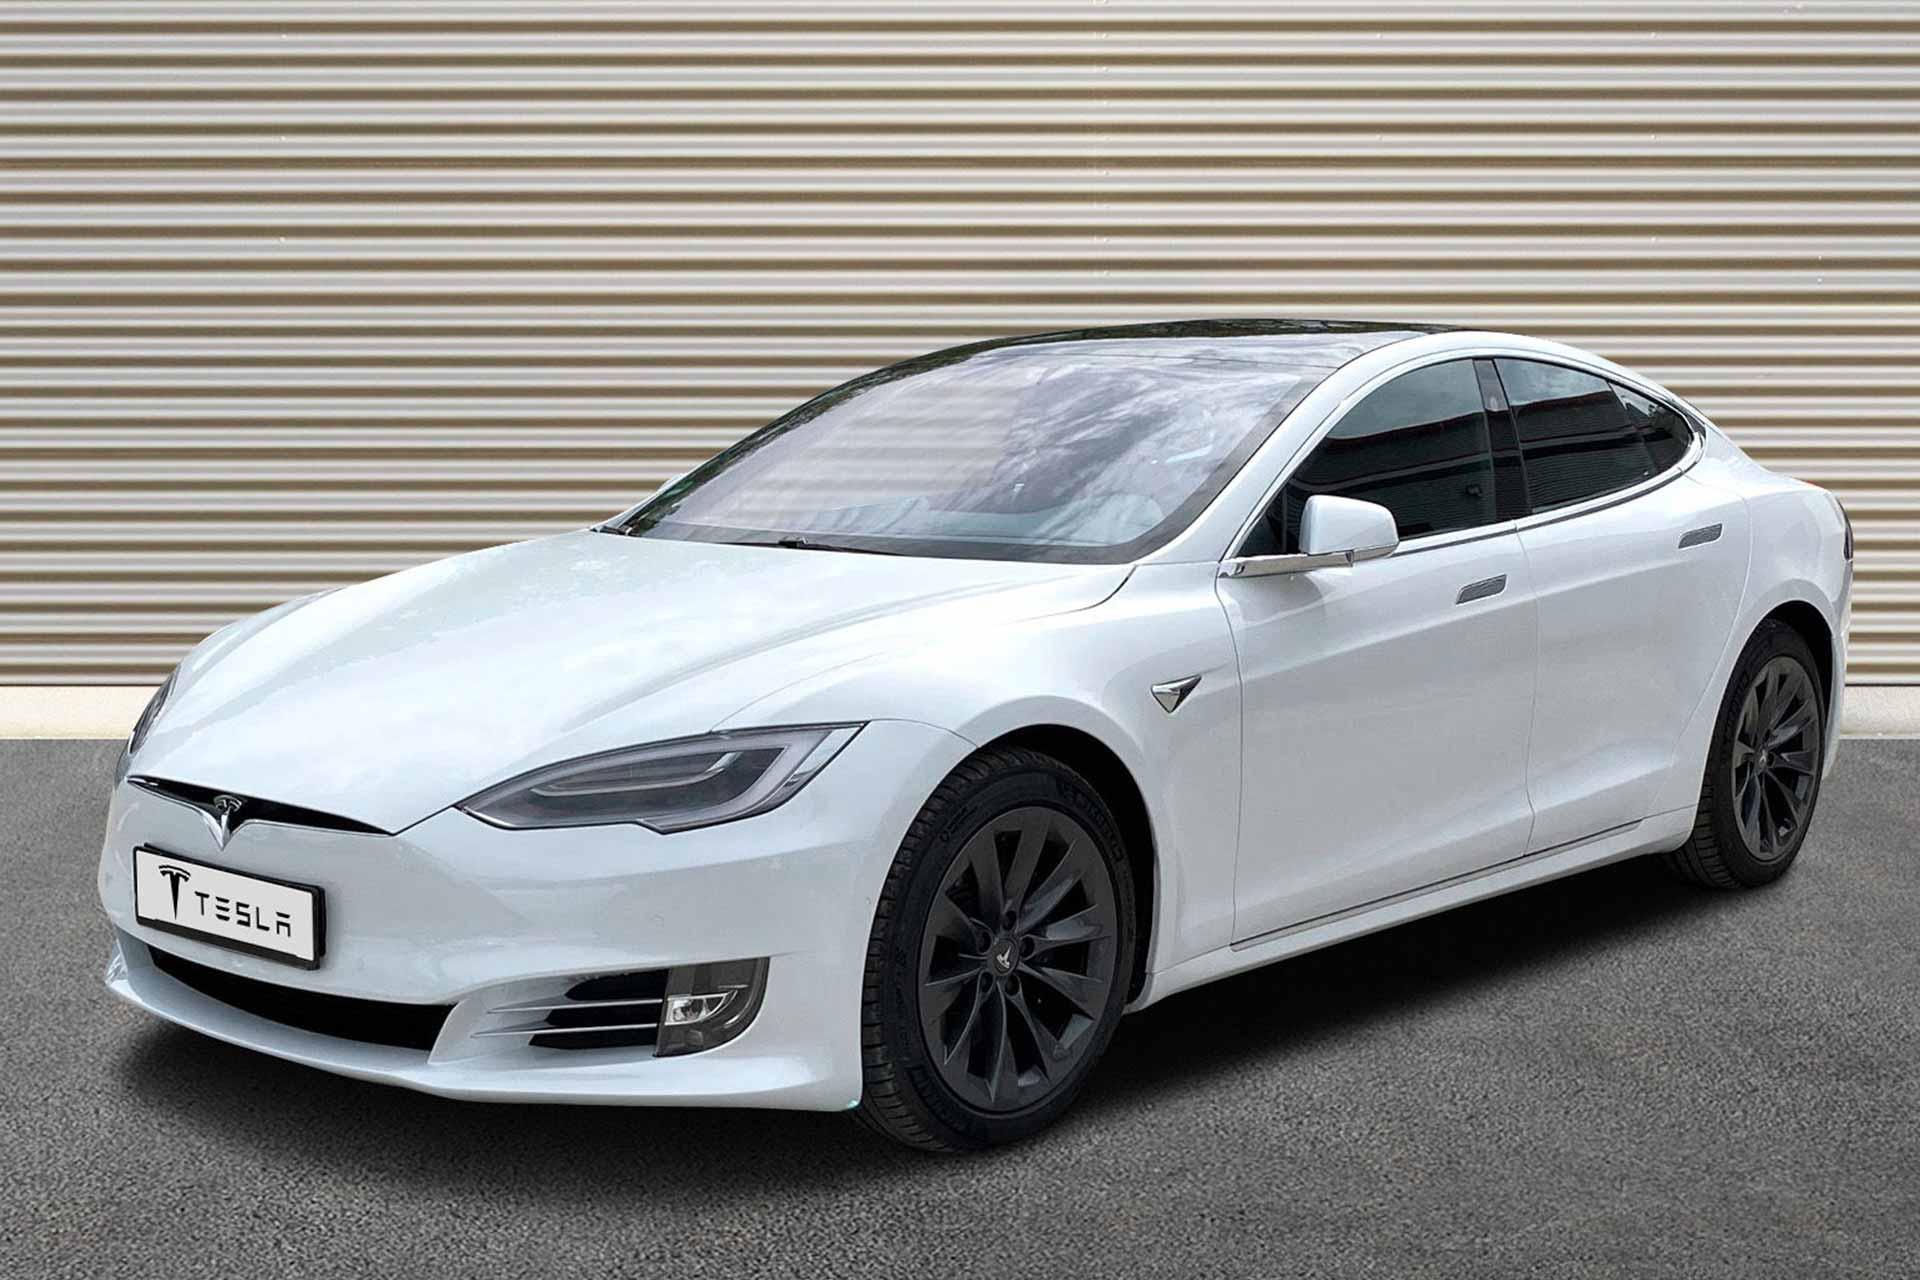 Model-S-LR-white-a